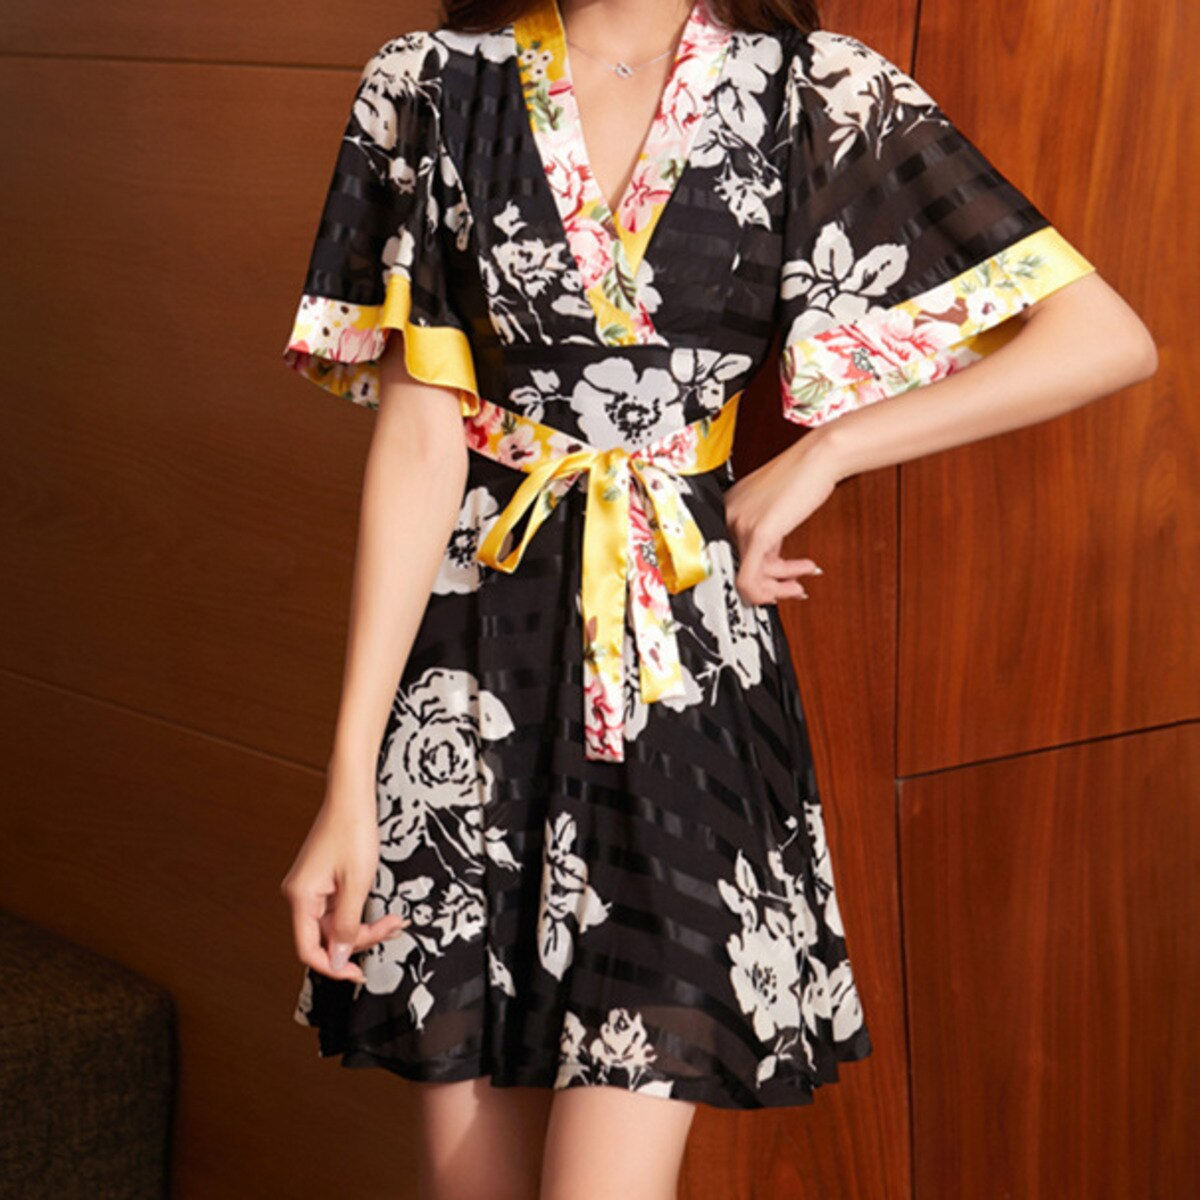 BacklakeGirls 2021 New Women Vintage V Neck Floral Print Bandage Kimono Mini Dress Female Chic Short Sleeve Casual Party Vestido